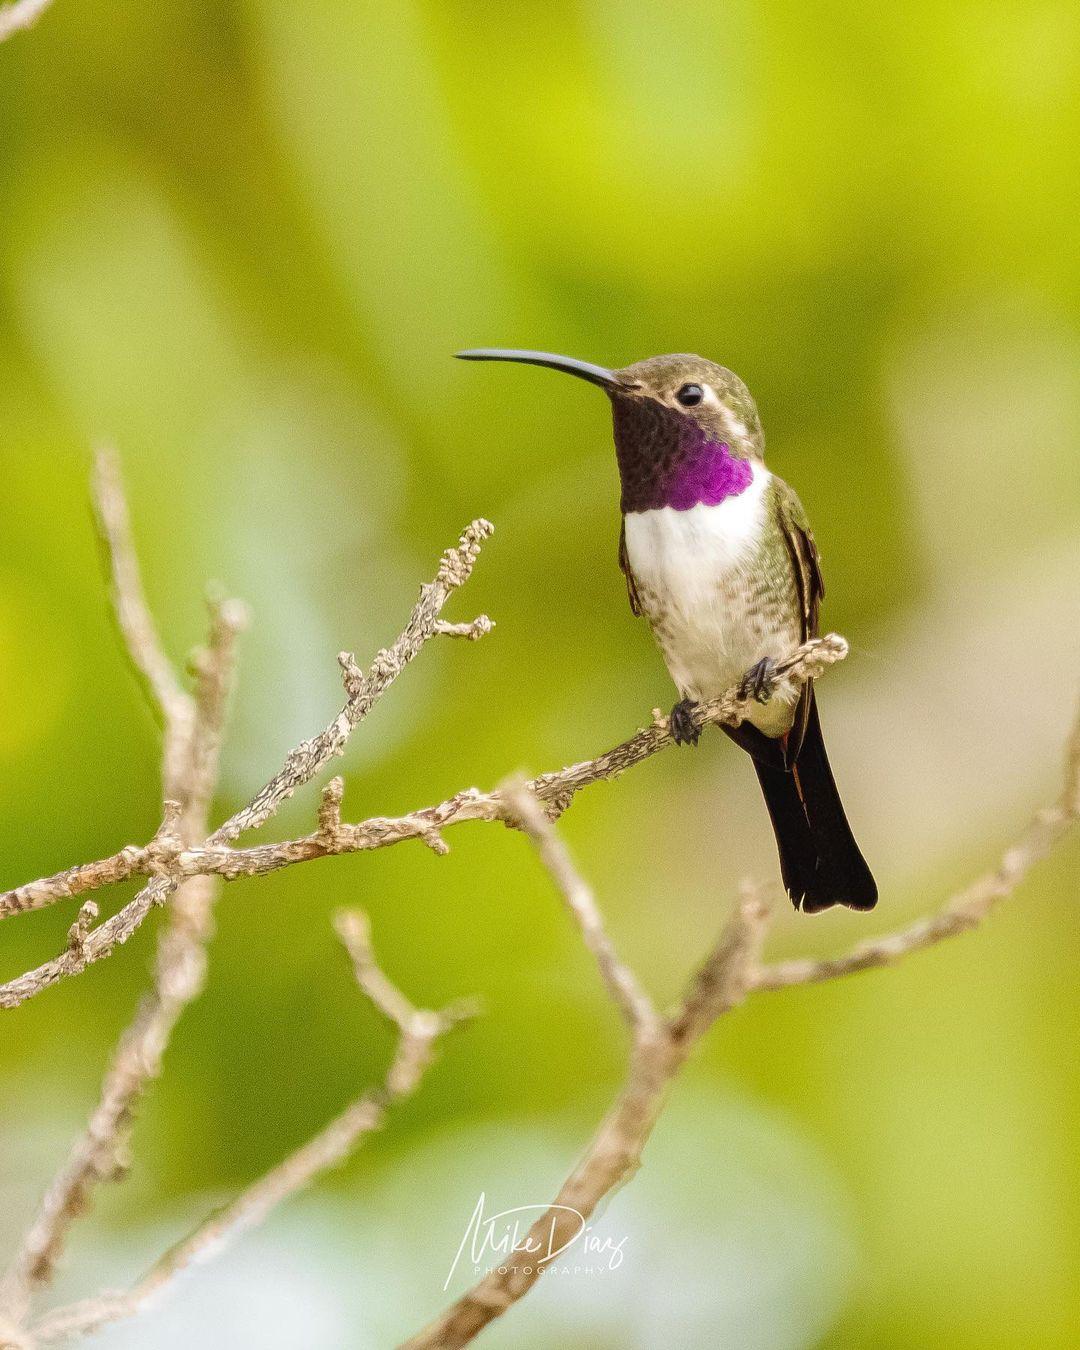 colibri tijereta